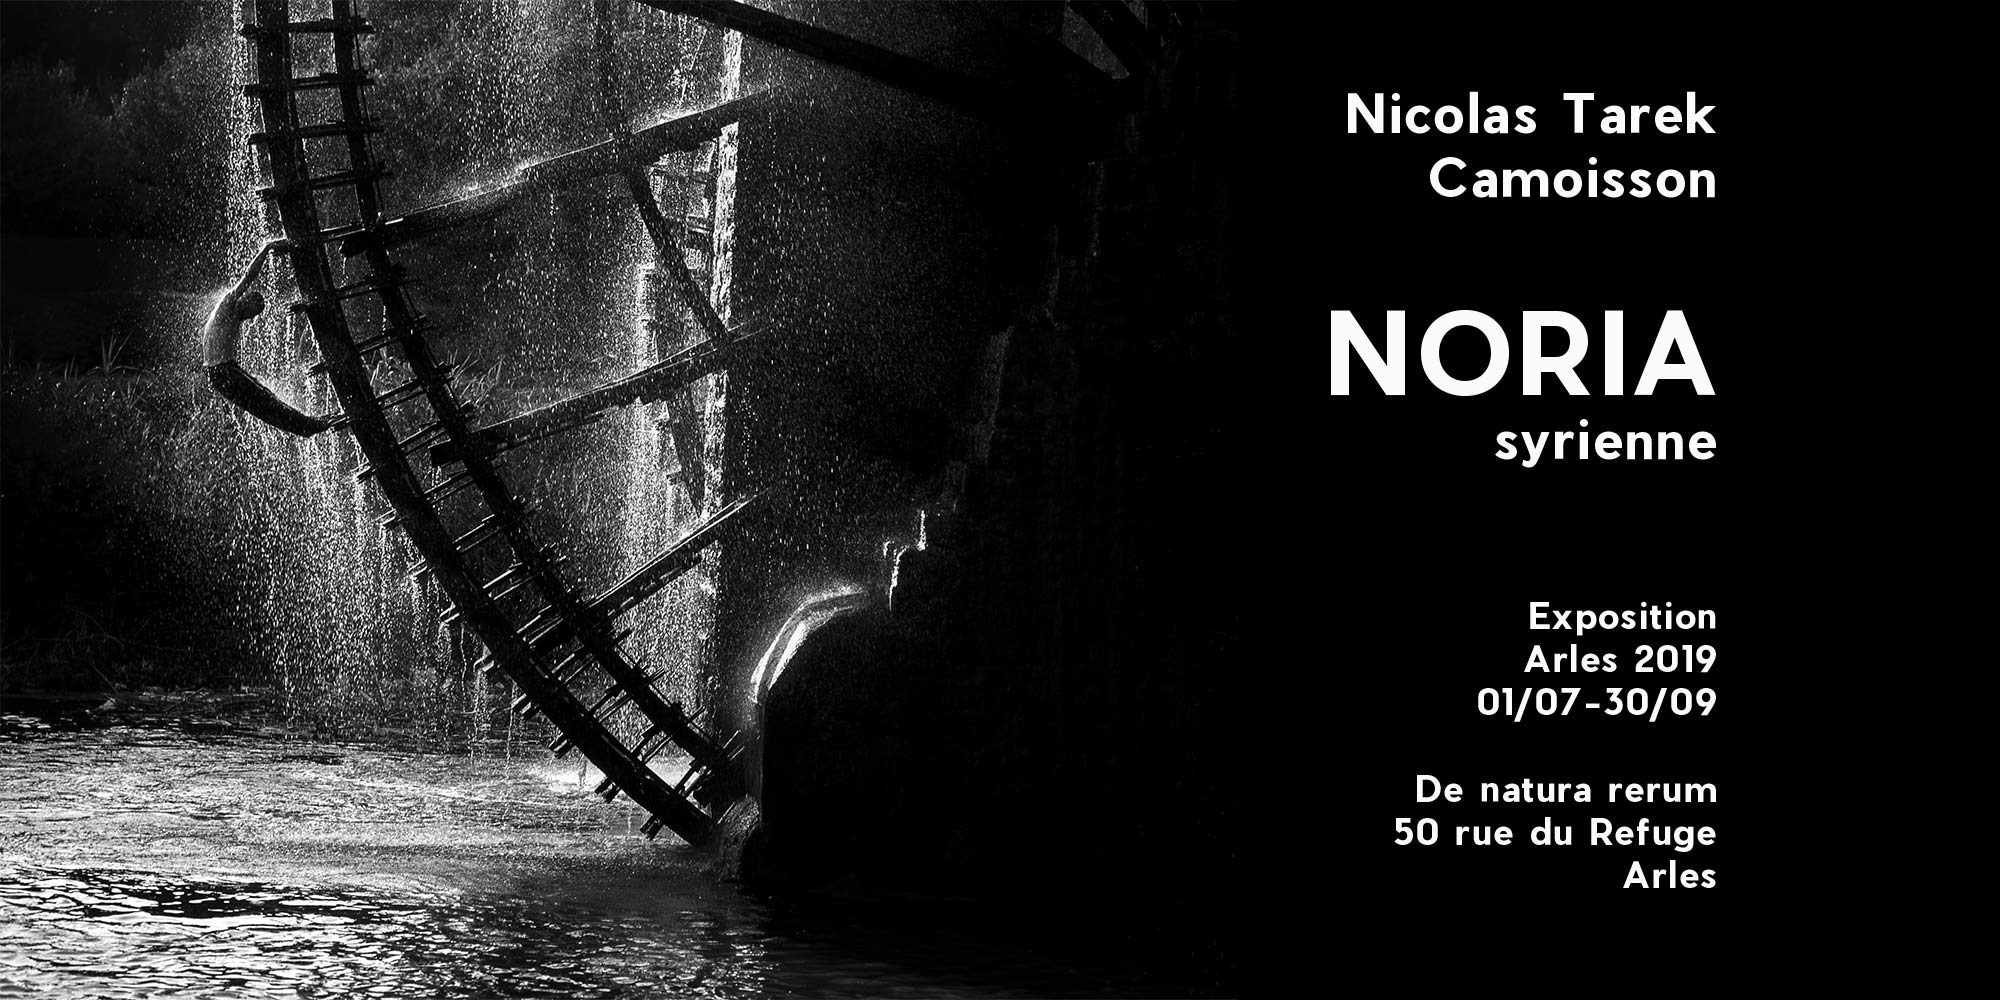 NORIA syrienne, exposition de photographies de Nicolas T. Camoisson, De natura rerum, Arles, été 2019